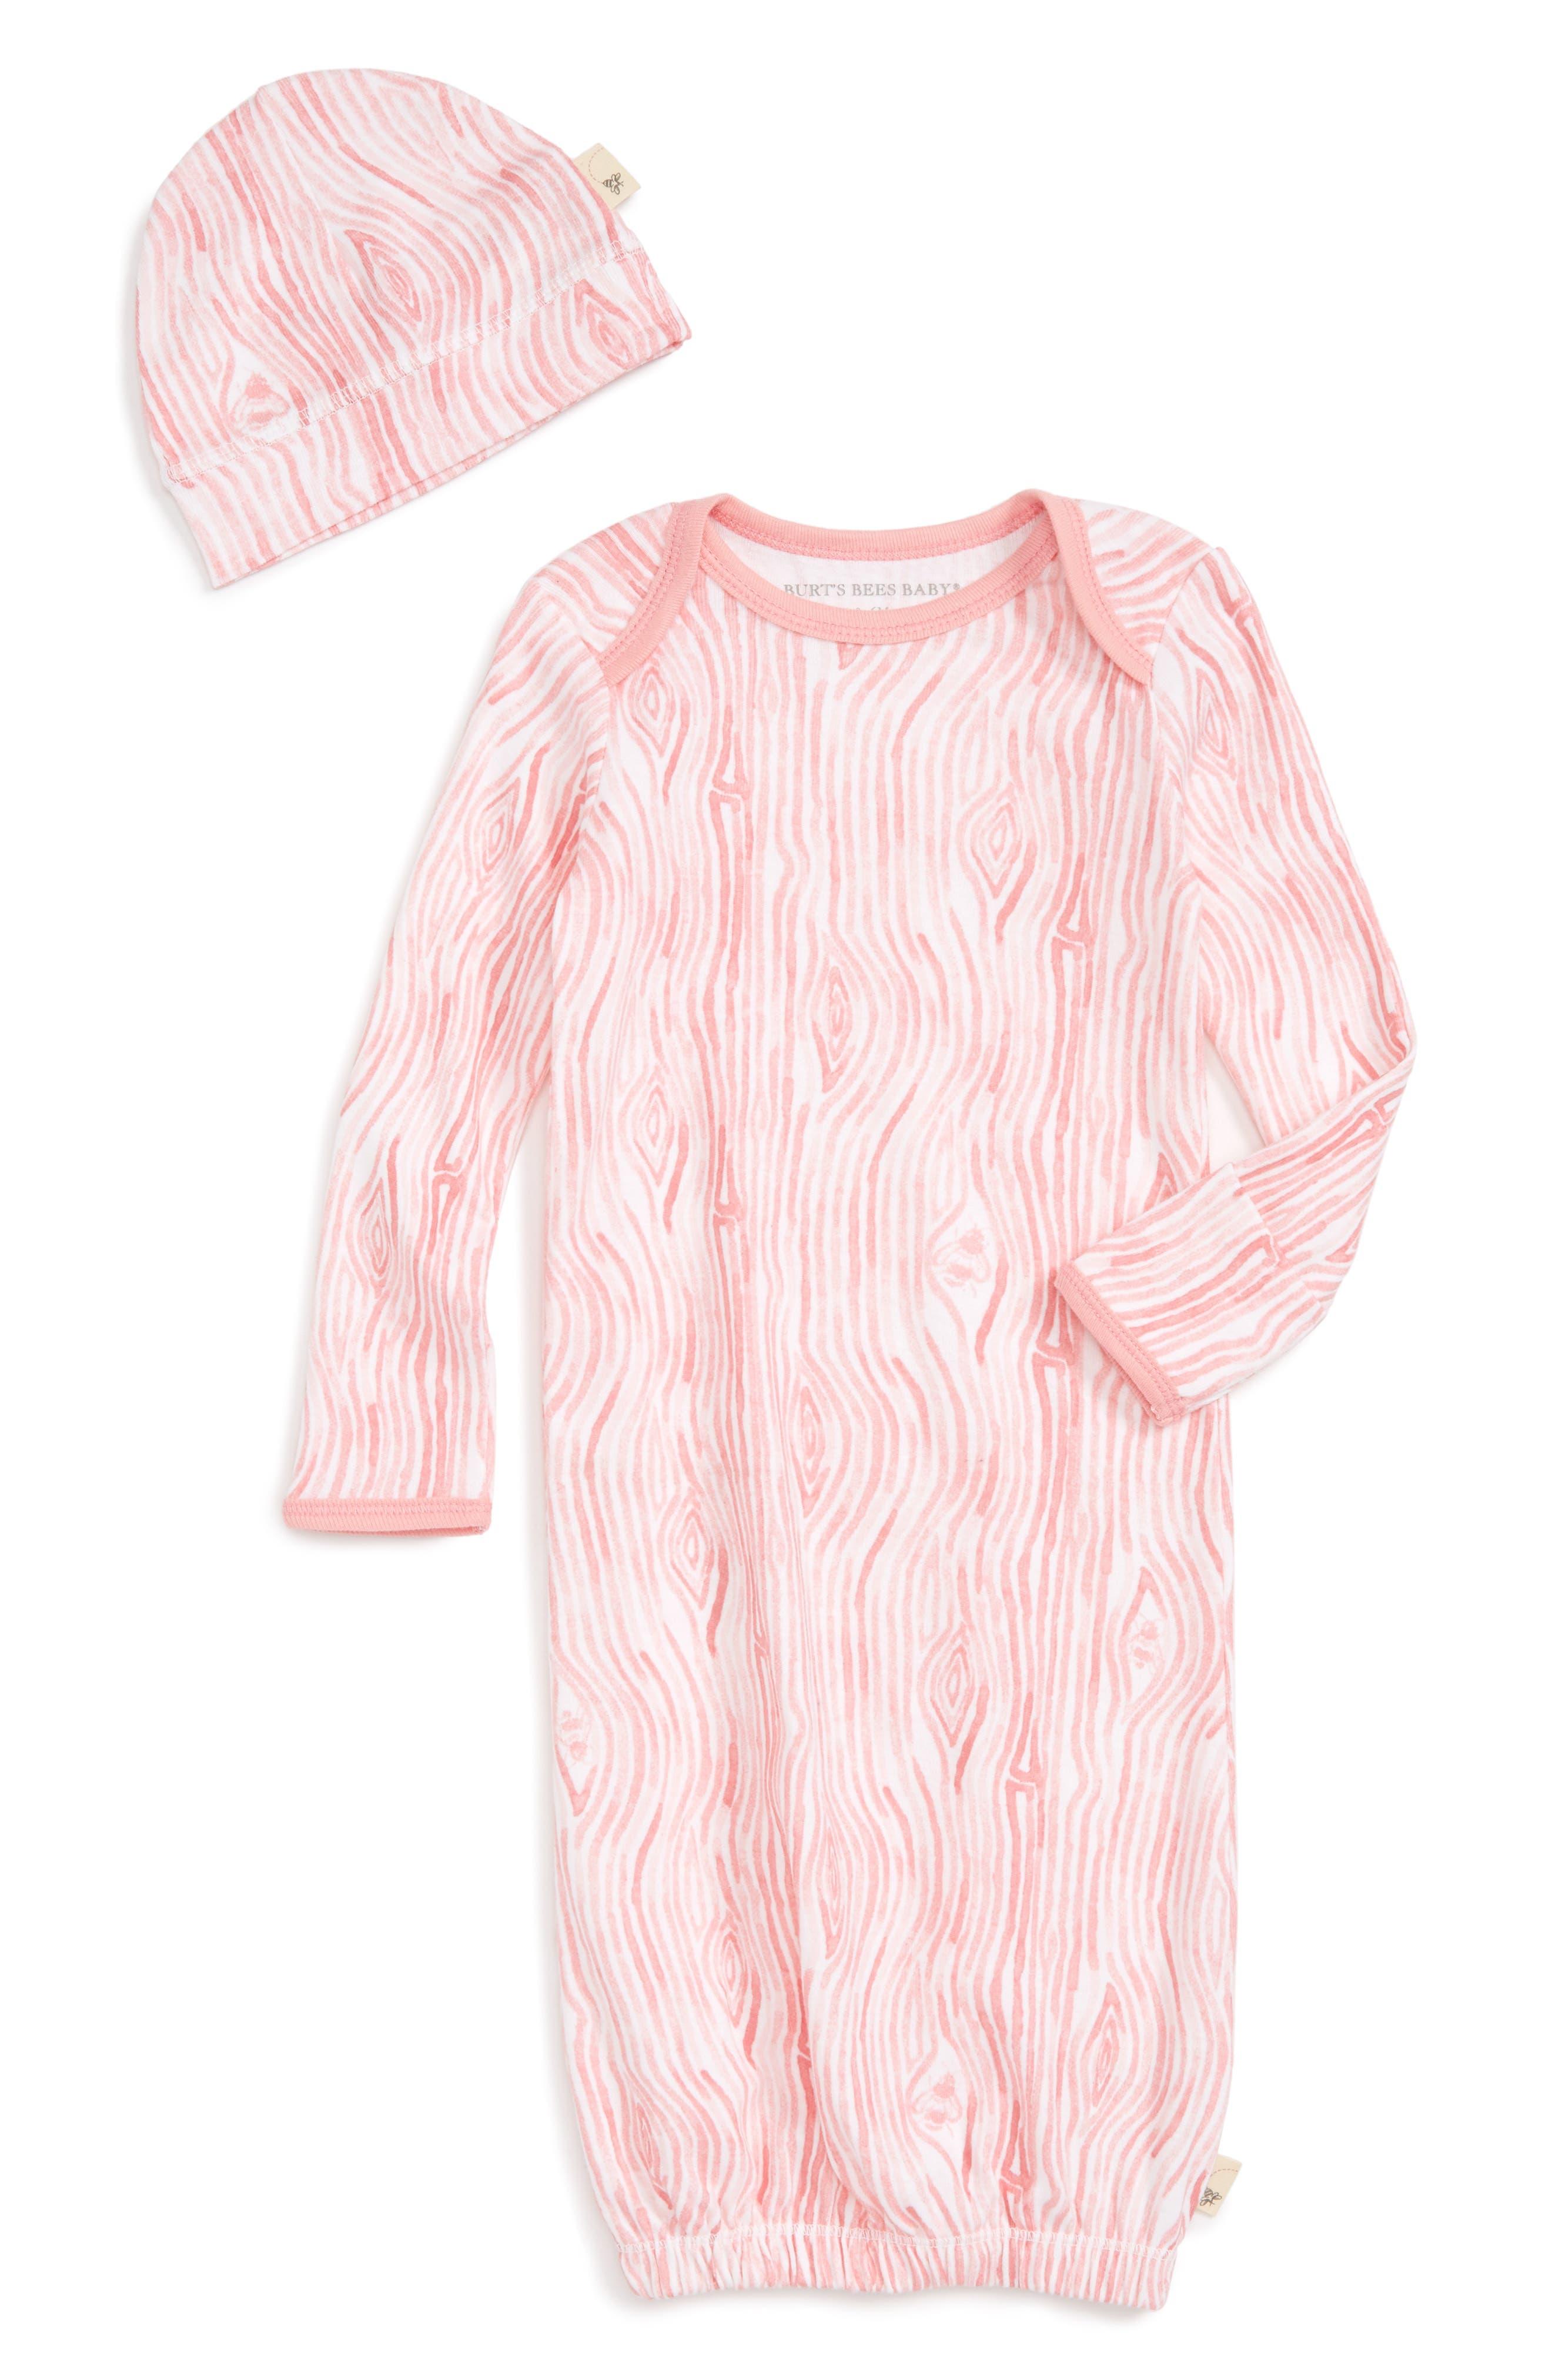 Burt's Bees Baby Watercolor Organic Cotton Gown & Hat Set (Baby Girls)